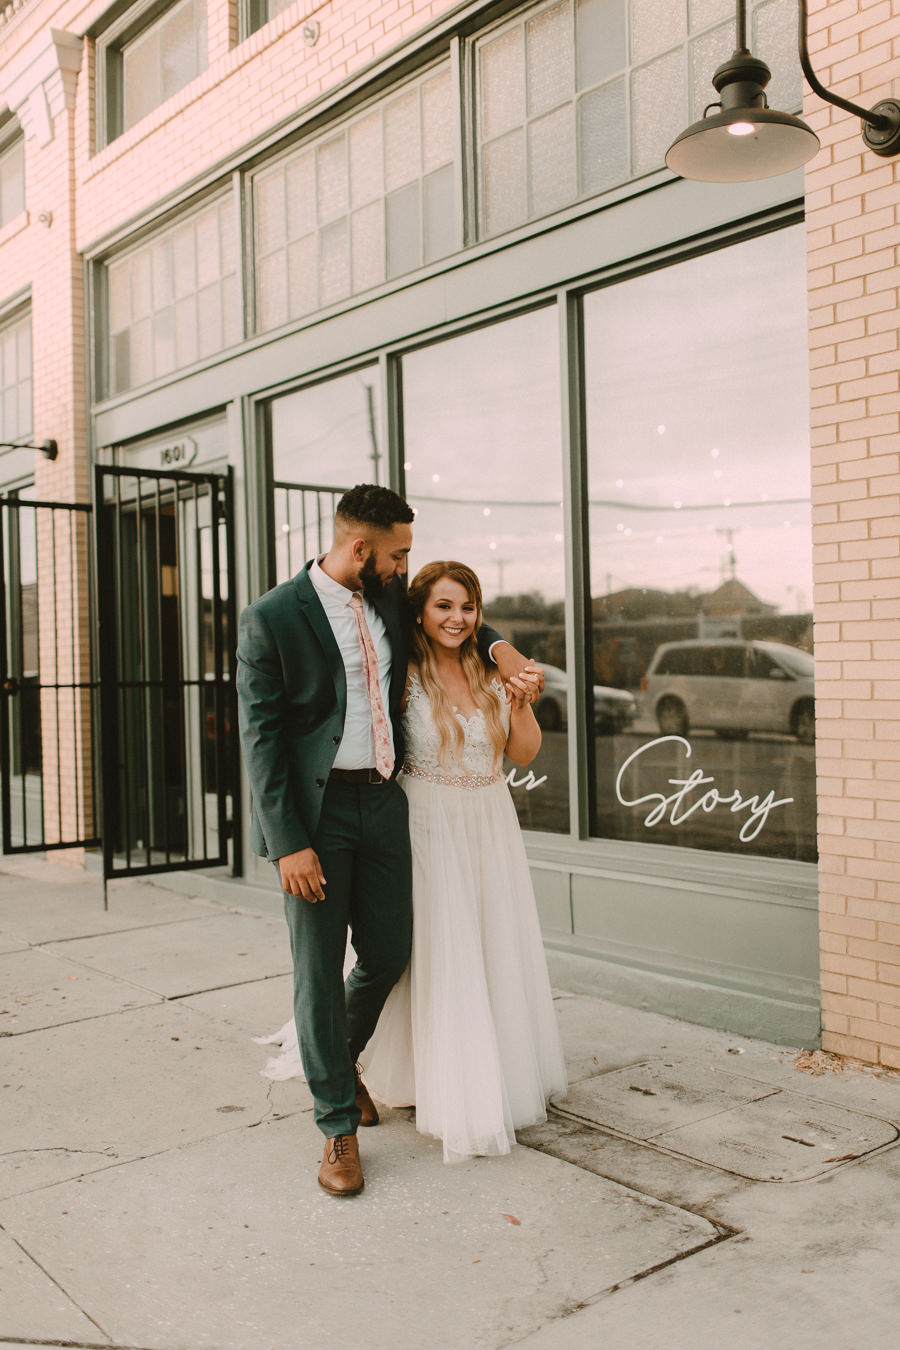 VeronicaandGarrett's Industrial Cavu Tampa Heights Wedding BHLDN gown Salt Block Hospitality Fancy Free Nursery Foundation Coffee-232.jpg